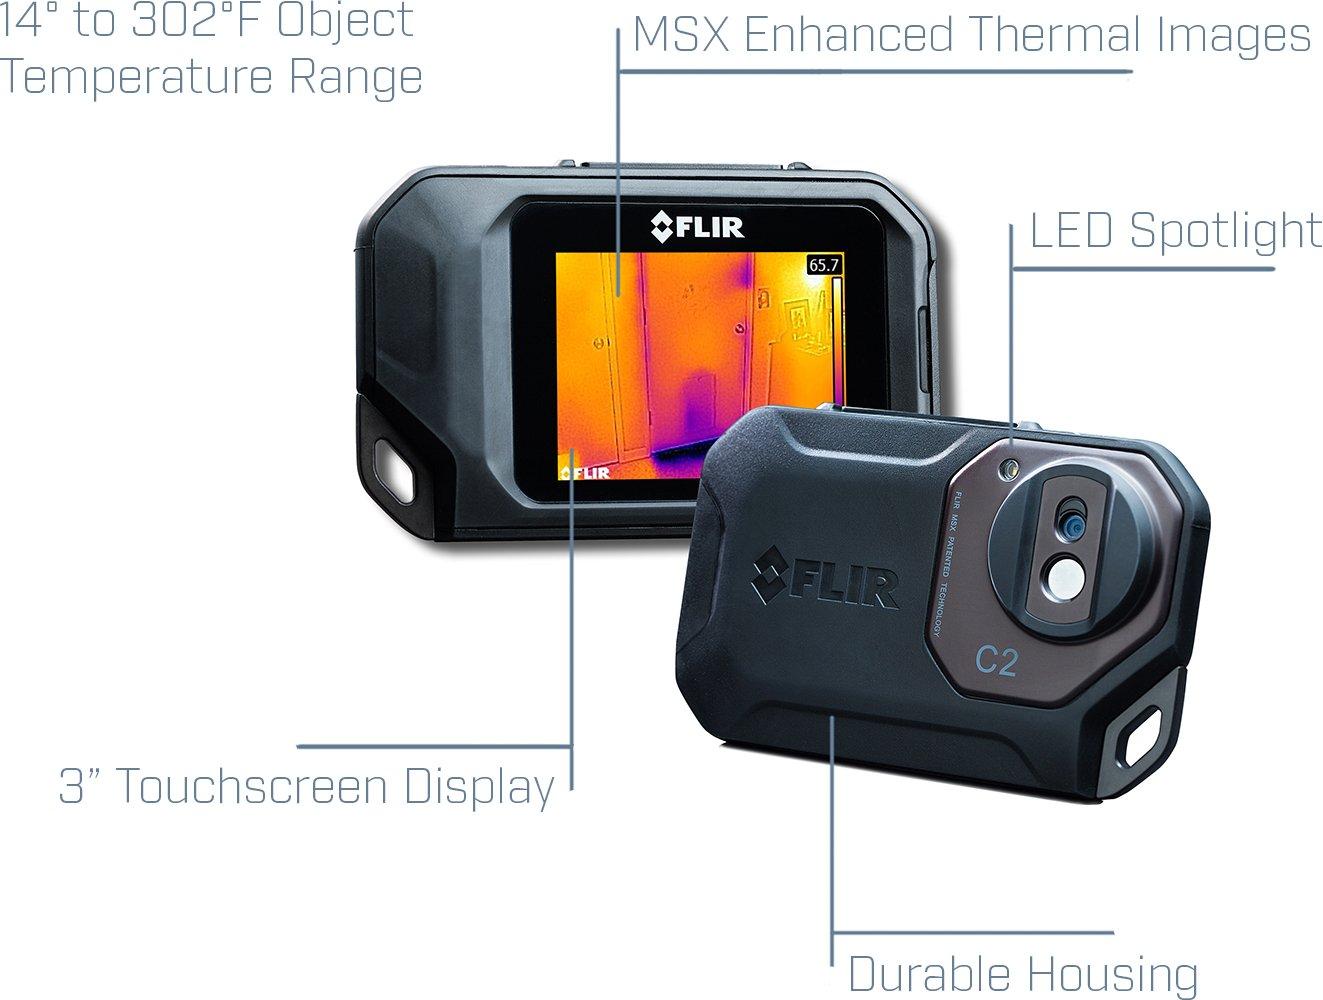 FLIR C2 Compact Thermal Imaging System by FLIR (Image #2)